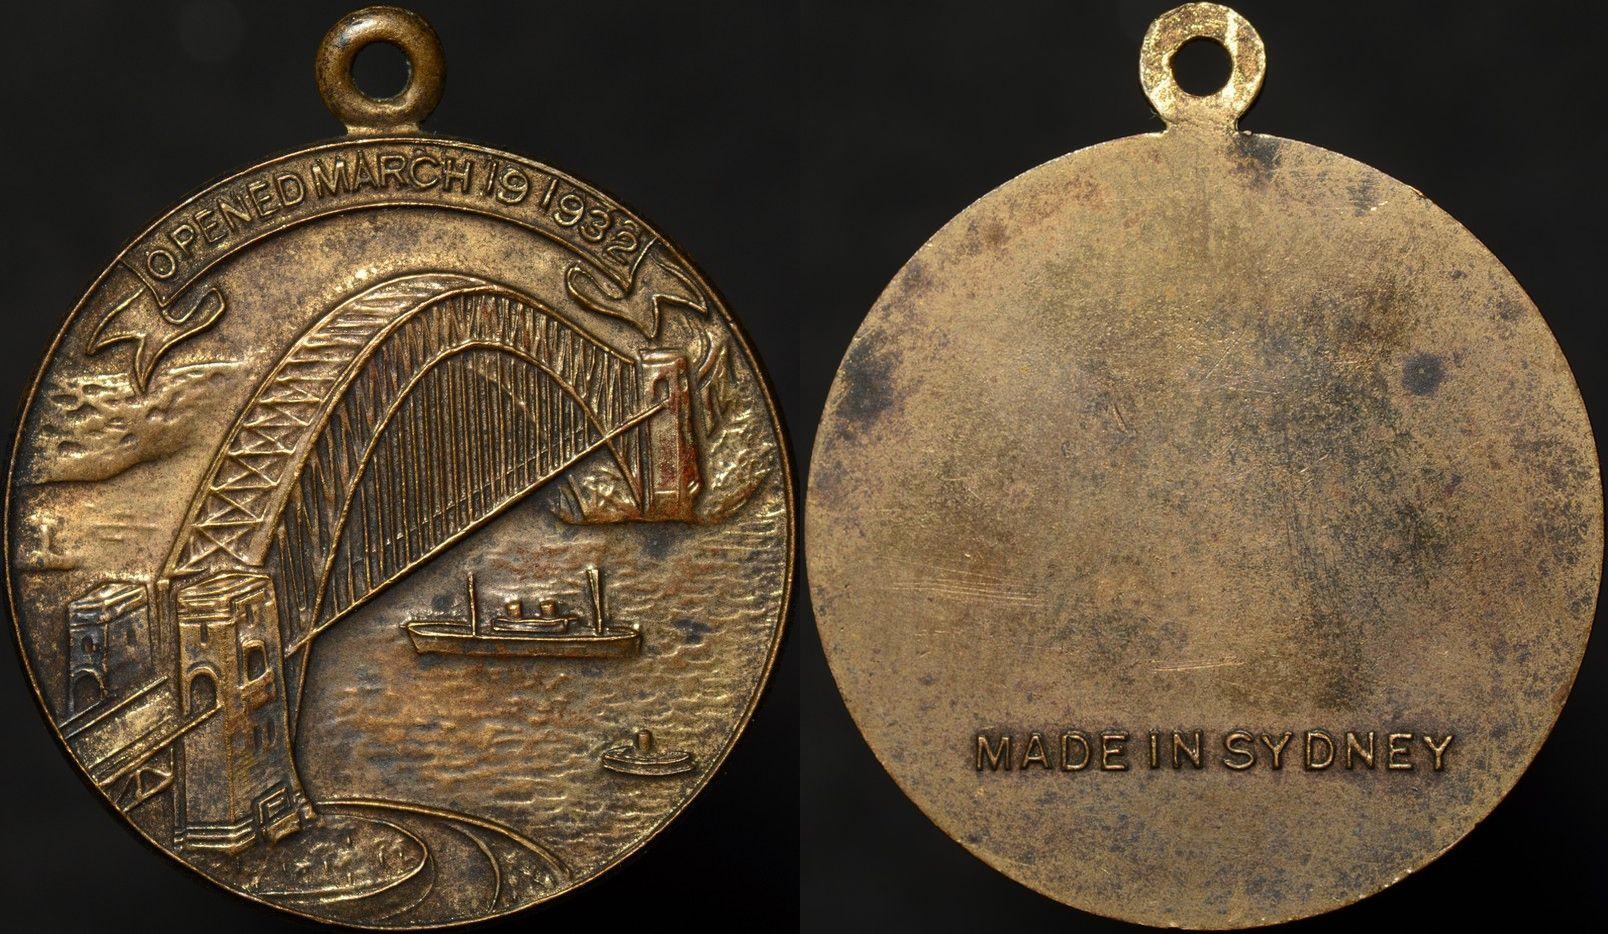 Sydney Harbour Bridge Medal 1932/1